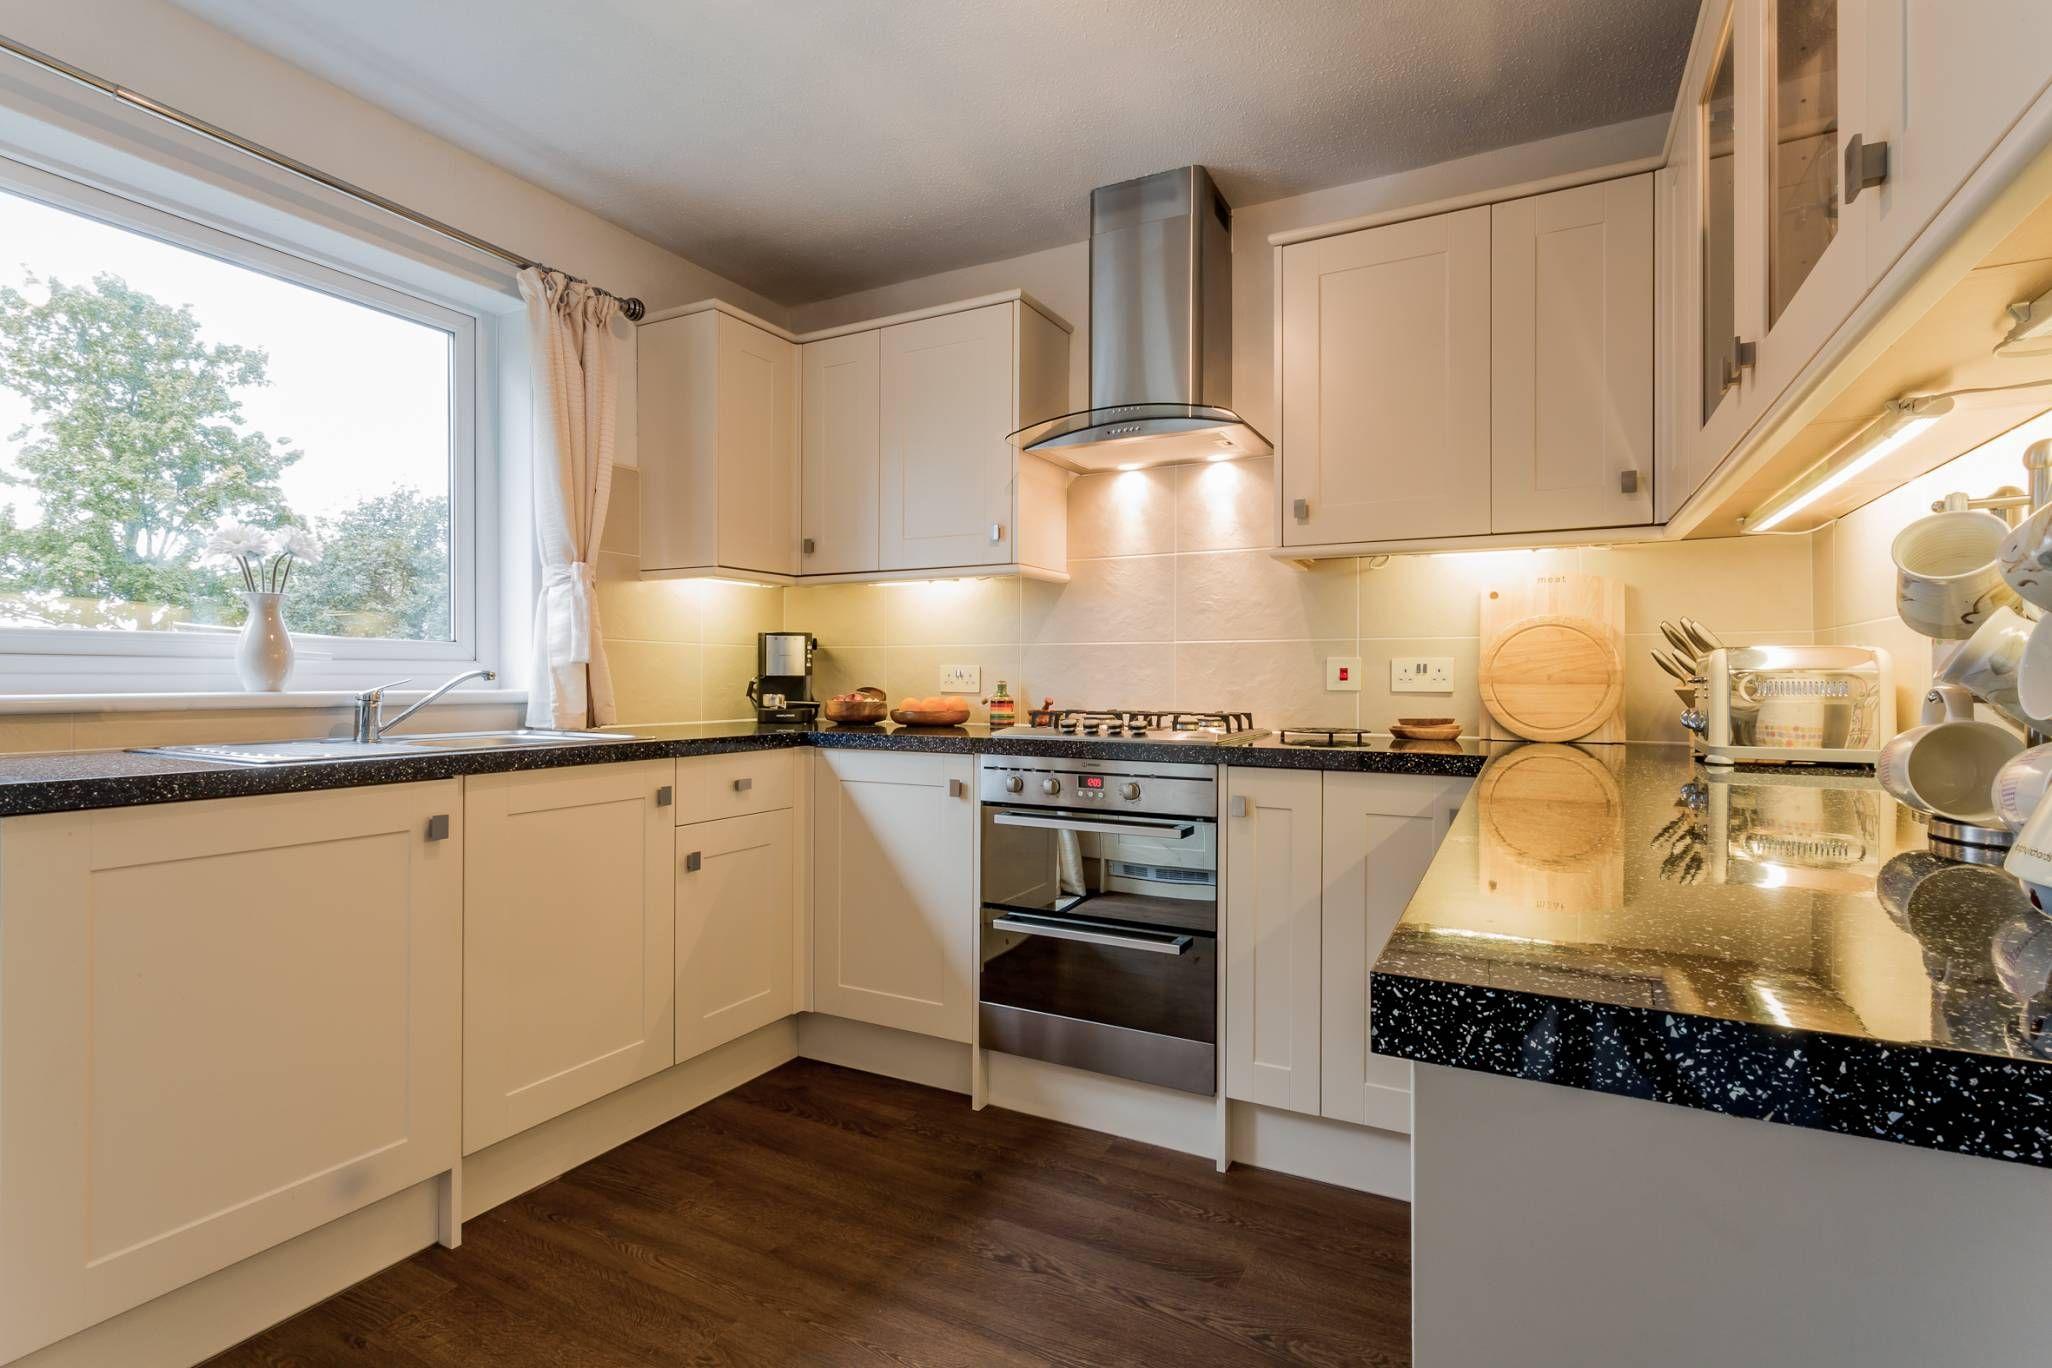 edinburgh  semi detached kitchen kitchen cabinets